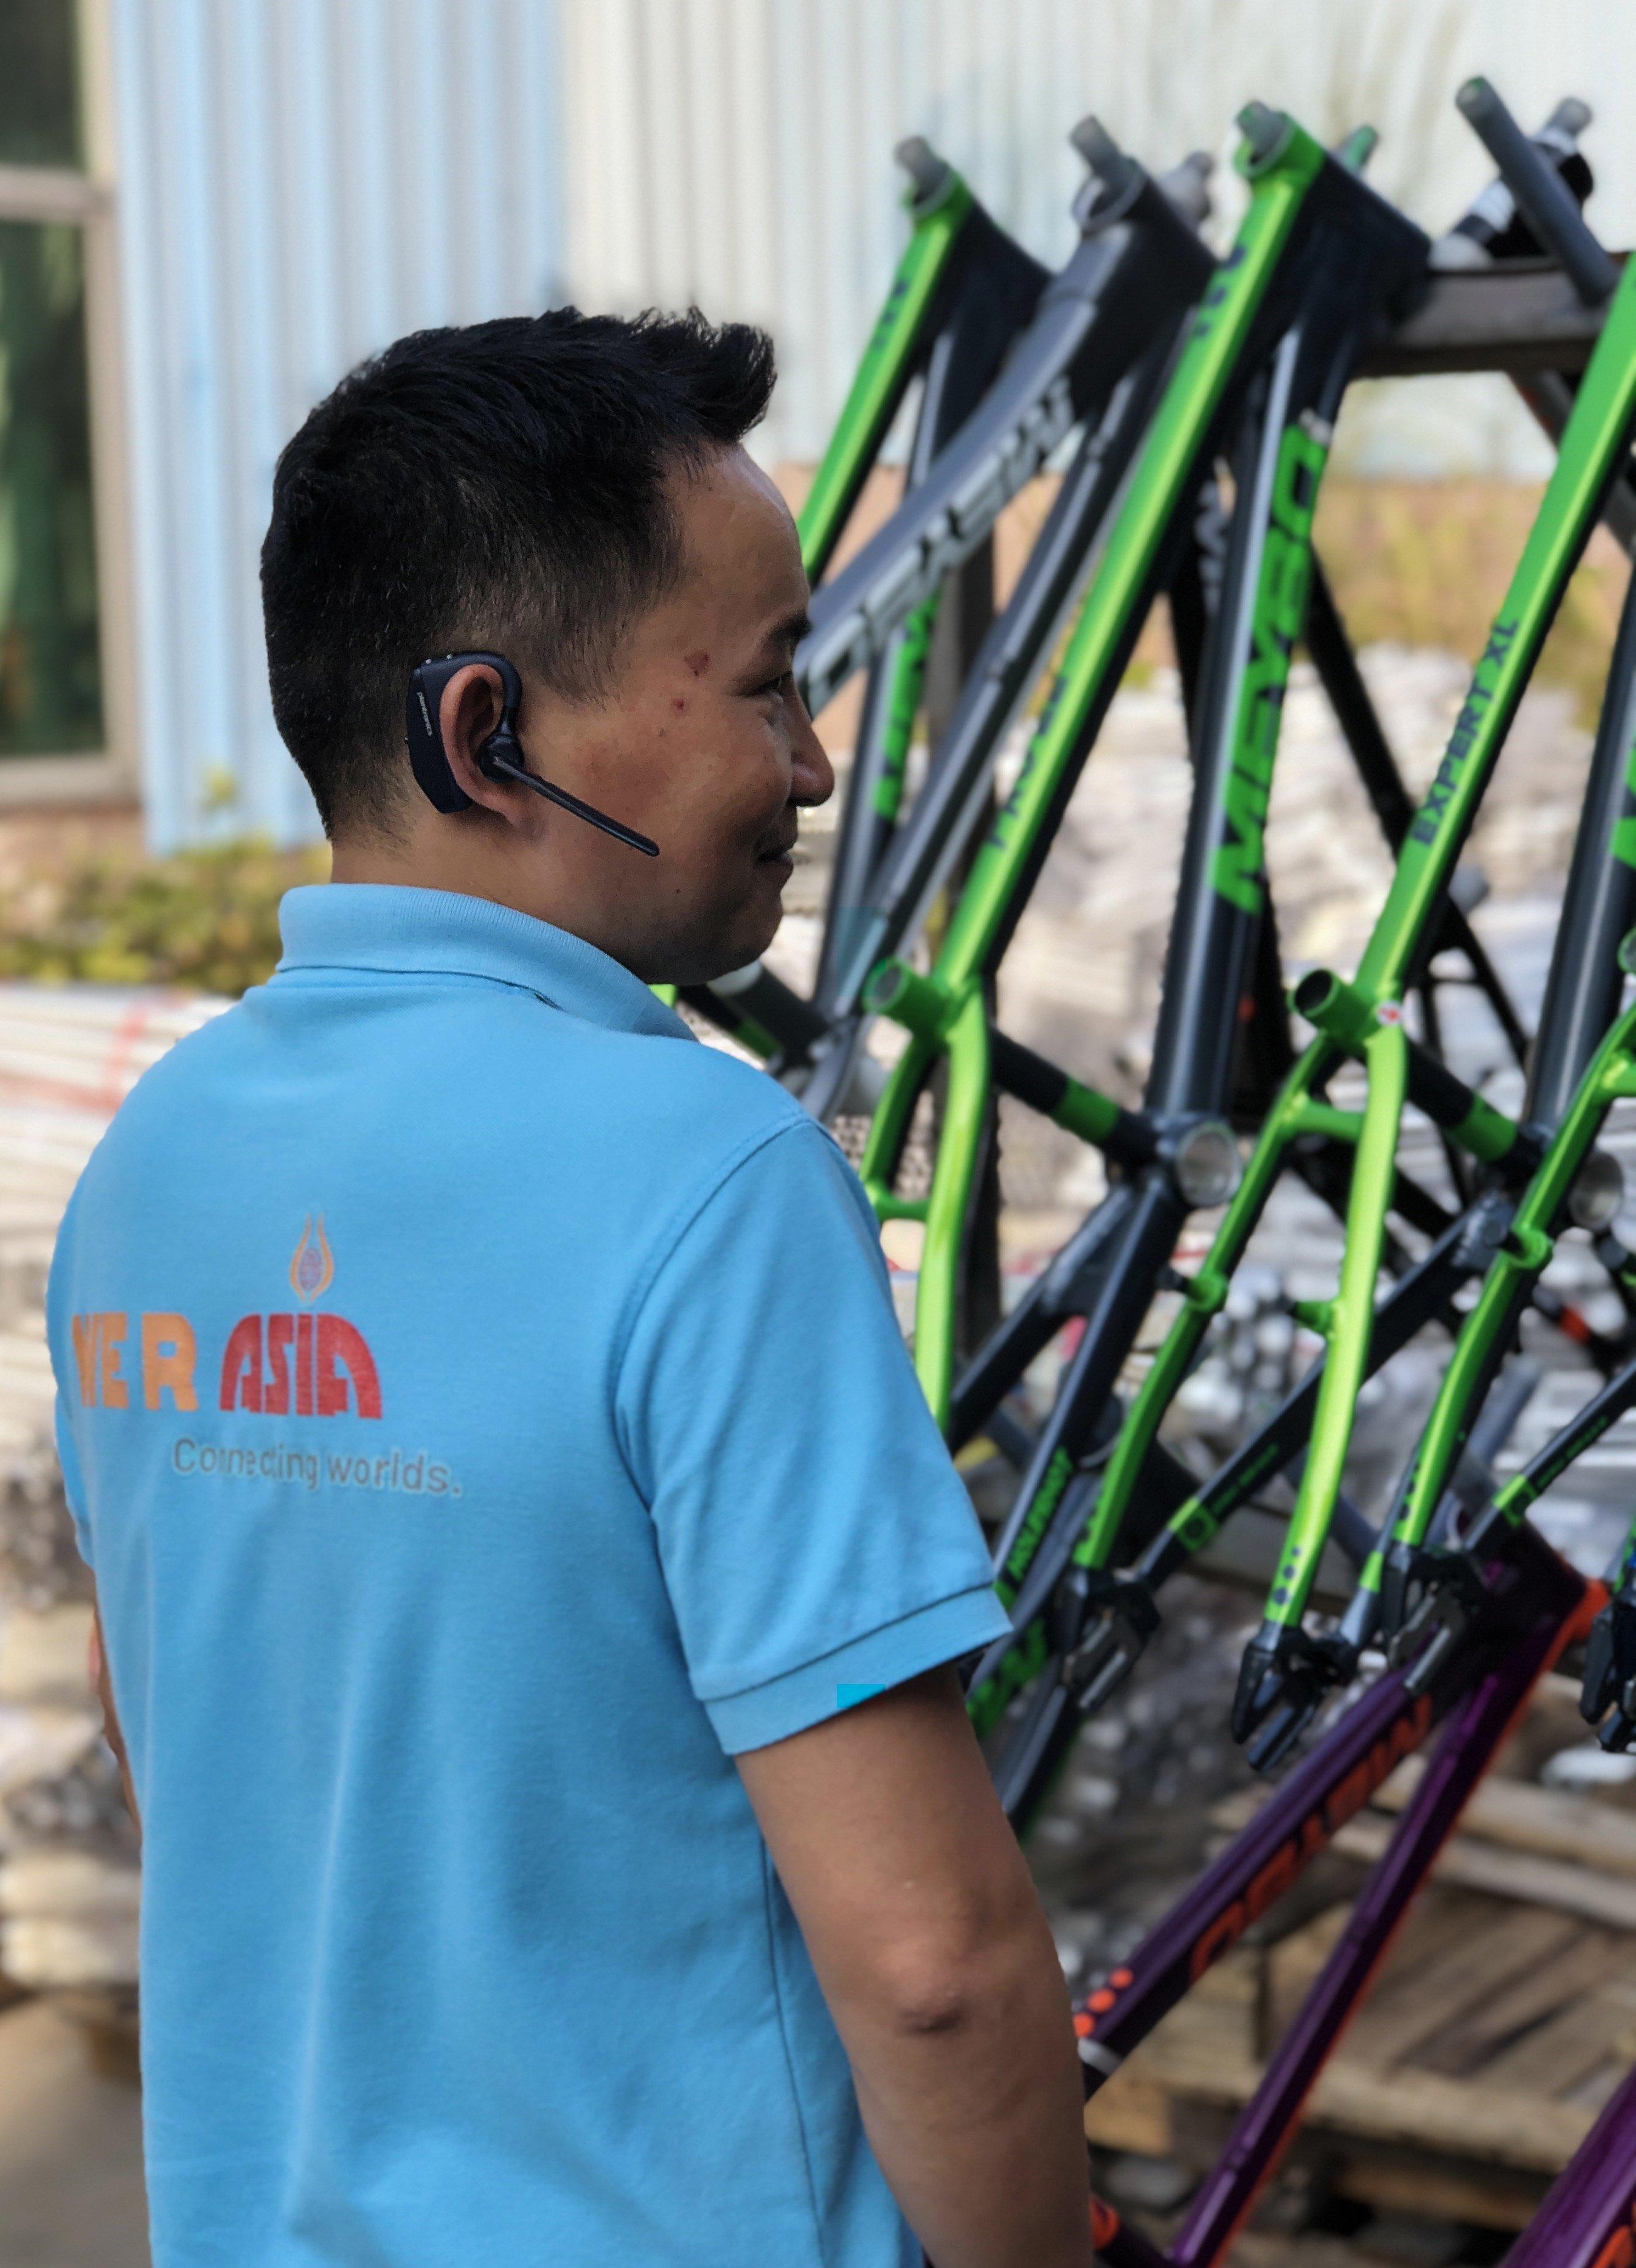 Schumi kwaliteitsinspecteur | We R Asia